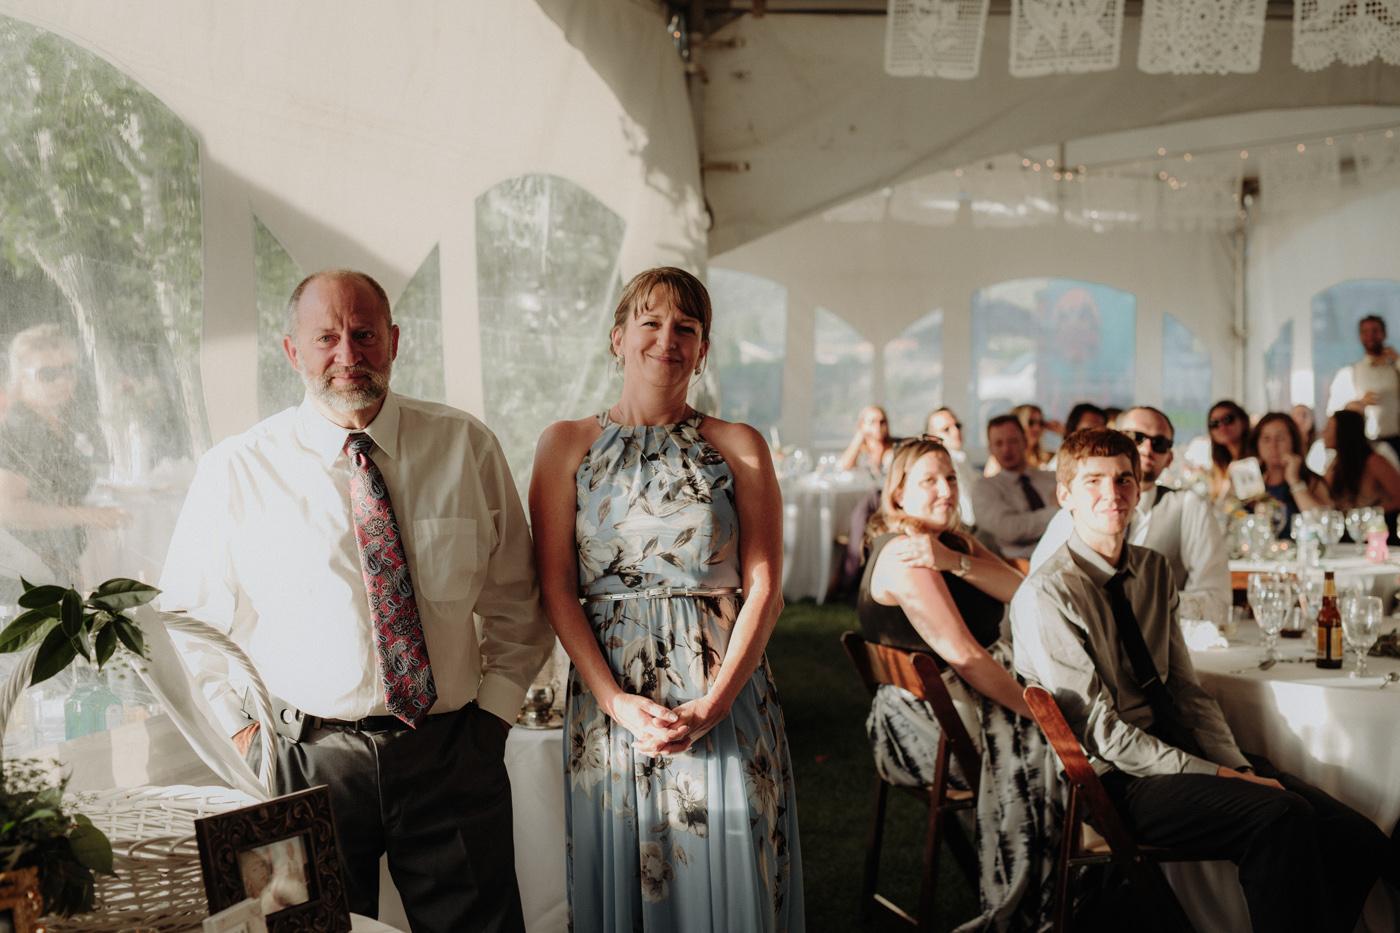 woods-walk-trail-crested-butte-colorado-wedding-108.jpg